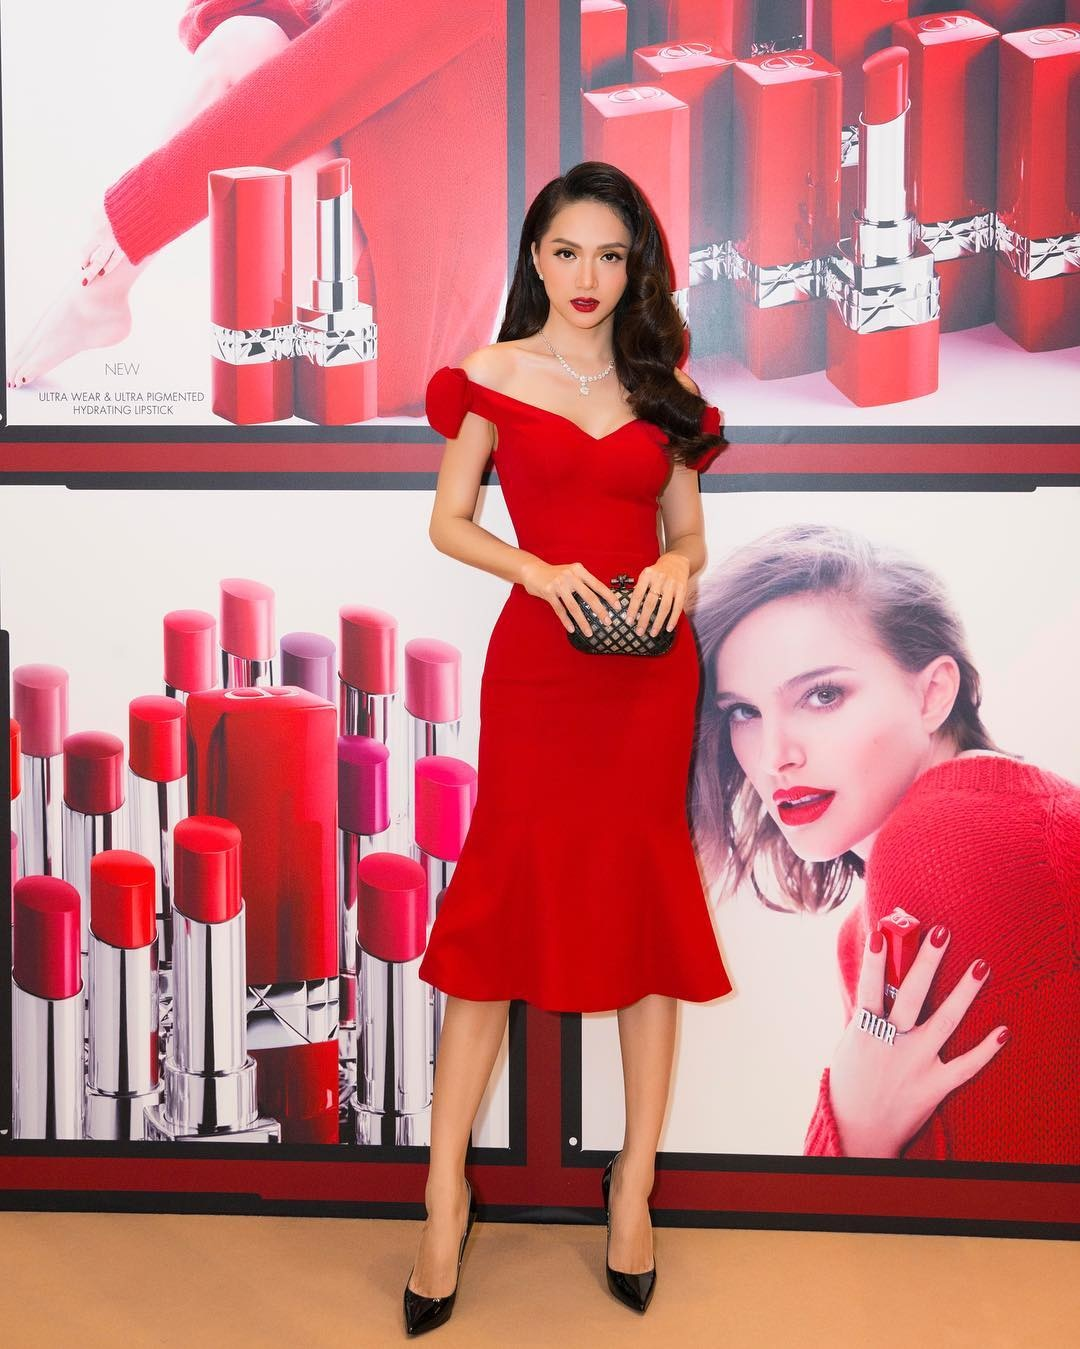 Summer Celebrity Party Bodycon Dress Woman Bandage Dresses Red Sleeveless V-Neck Runway Sexy Split Night Club Dresses Vestidos